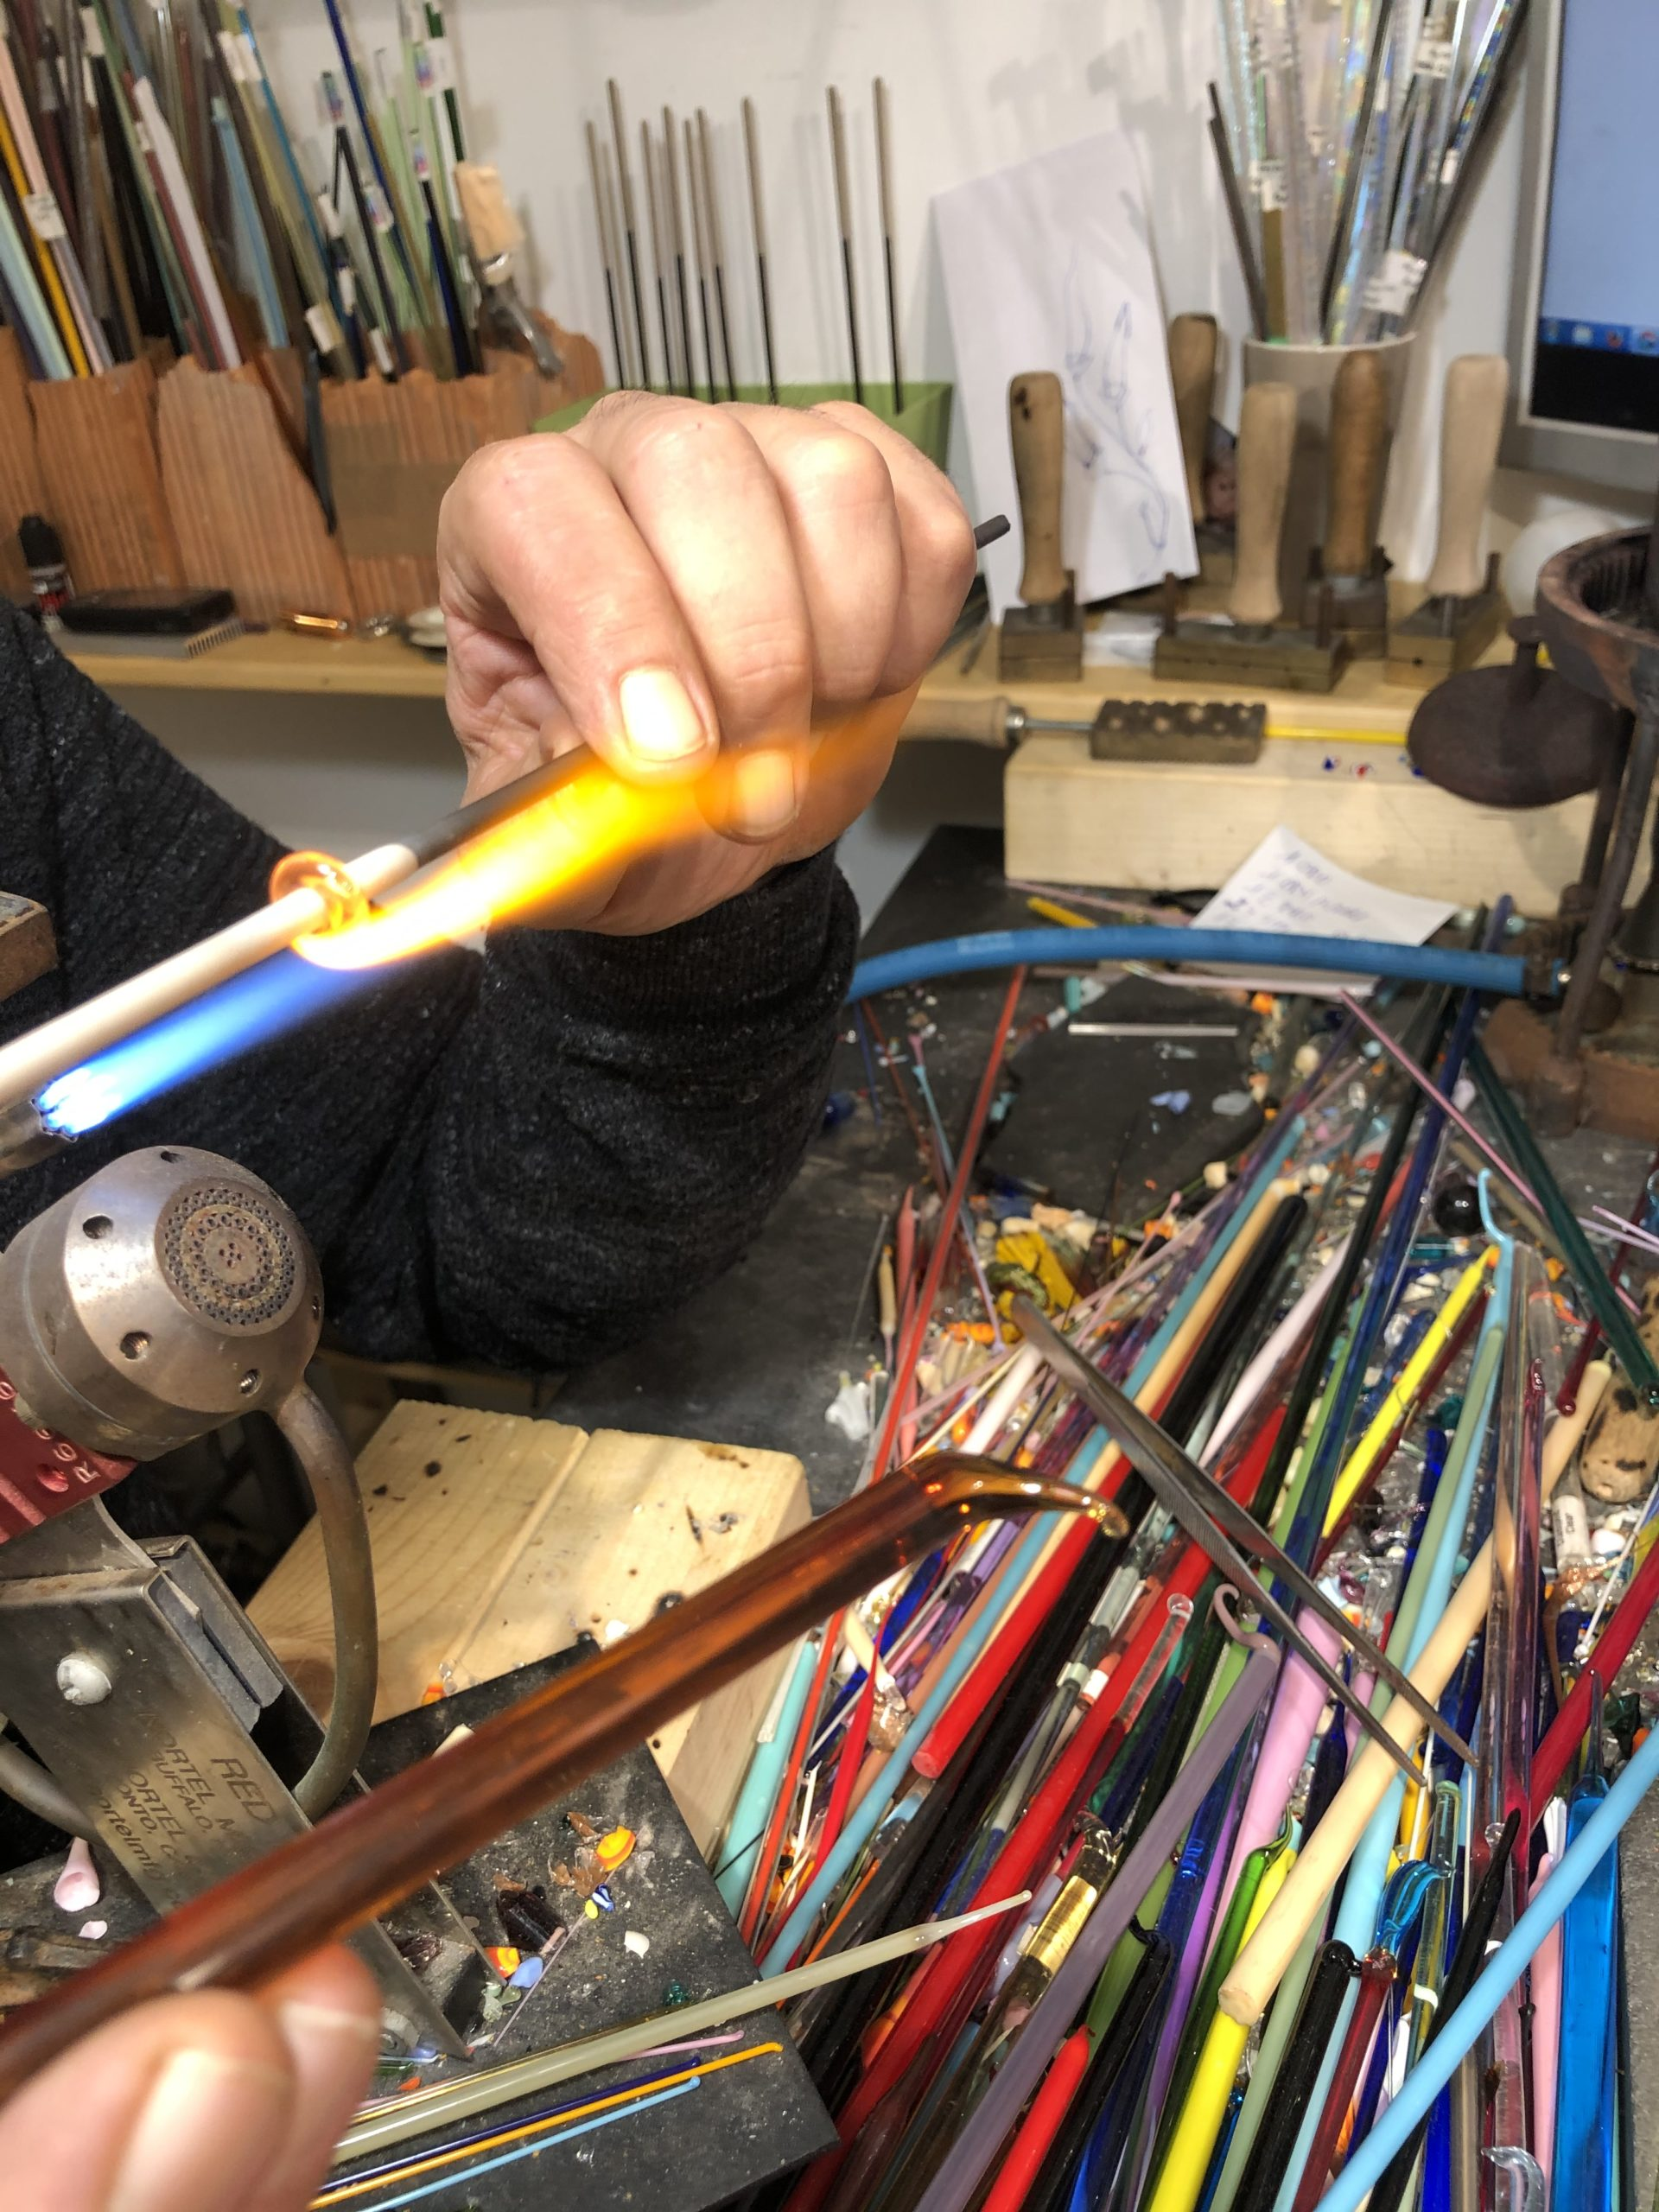 Incontriamo artigiani. Aldo crea col vetro.